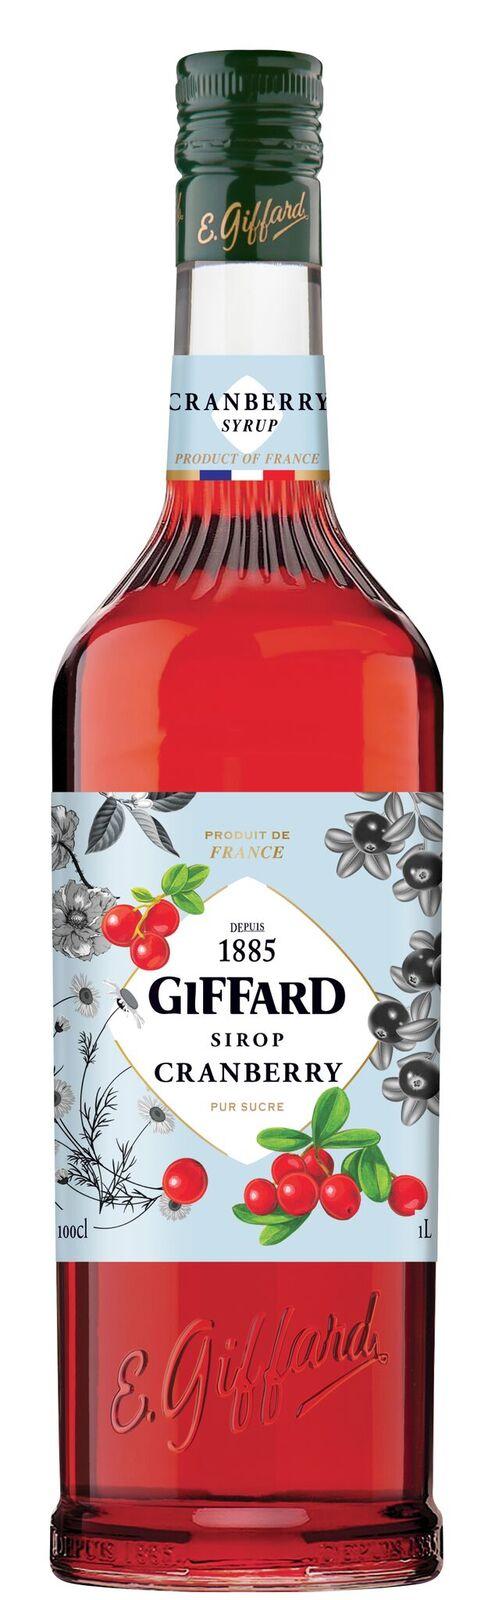 Giffard (sirupy, likéry) Giffard Cranberry - brusinkový sirup 1l